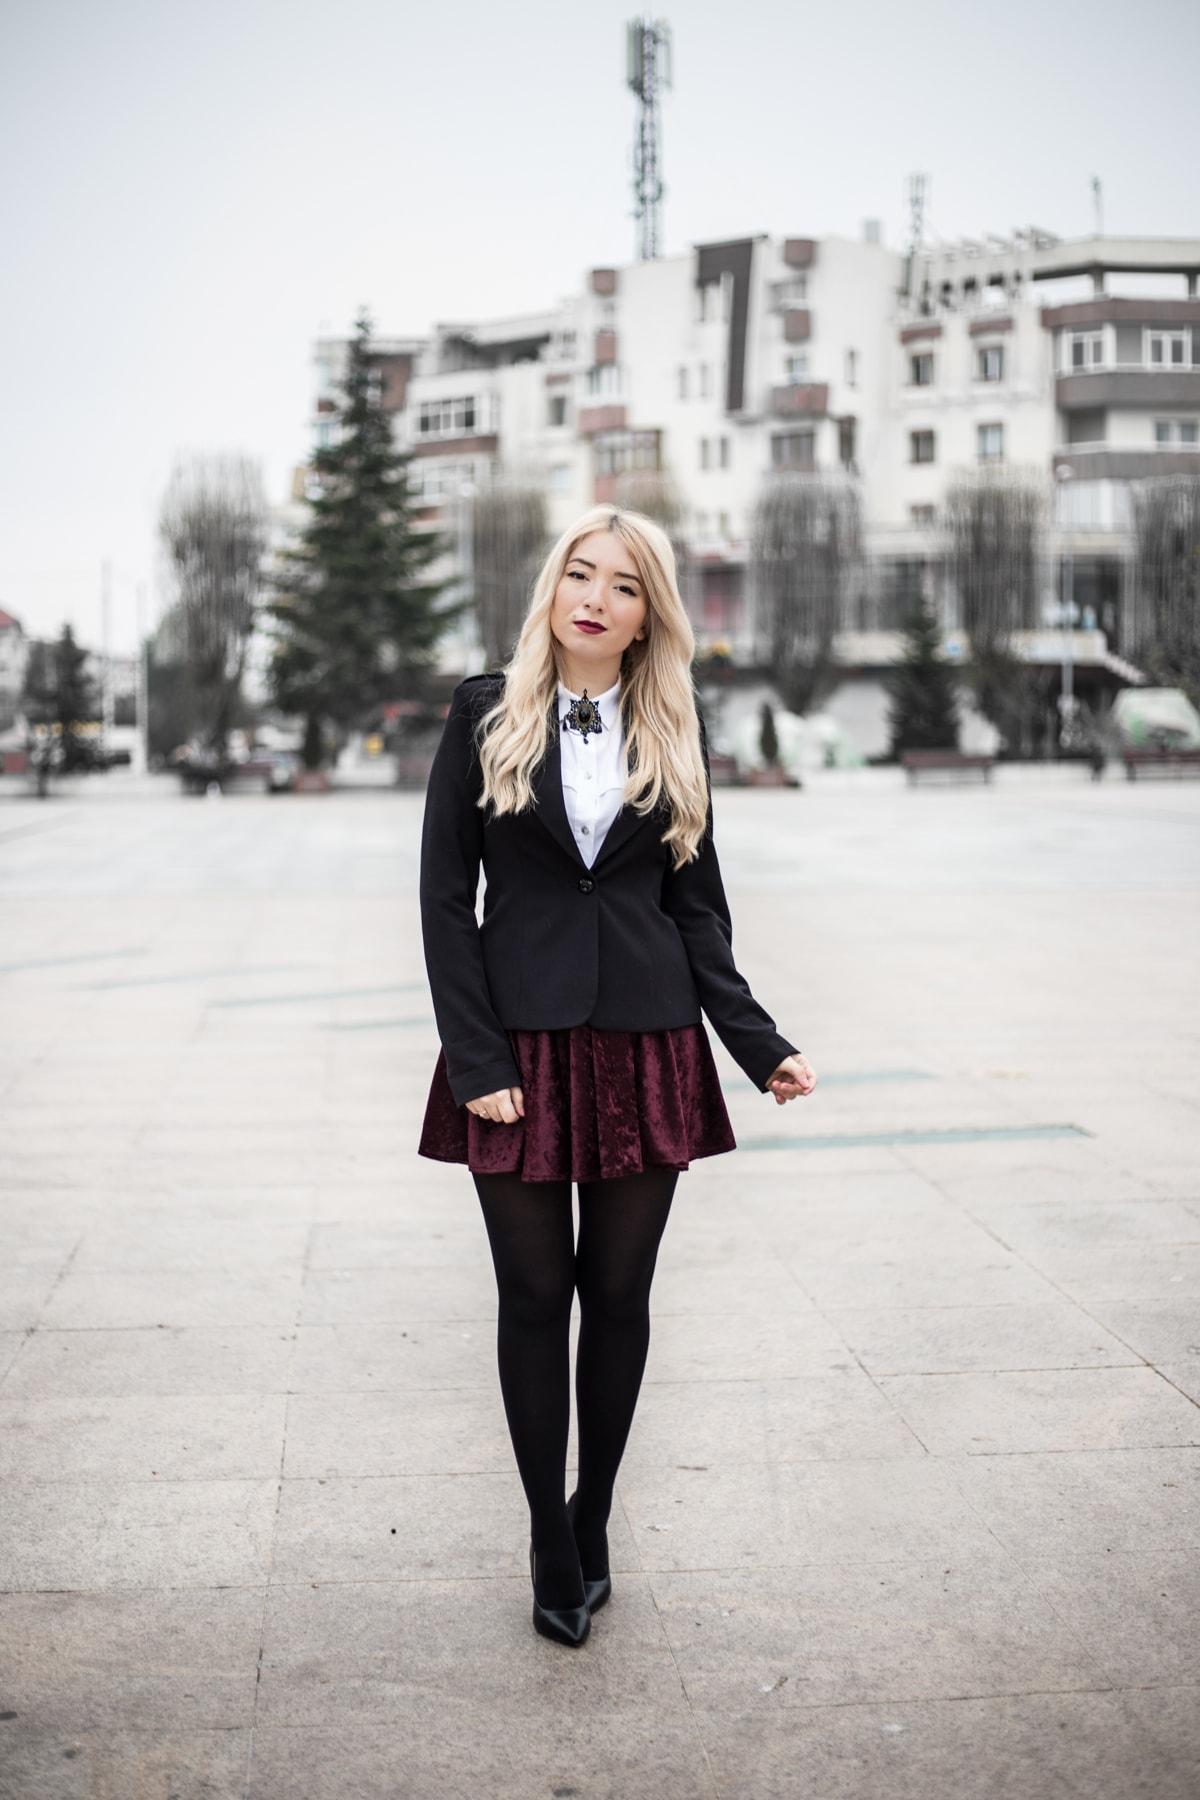 Andreea Ristea - fusta catifea mov pruna, clos, tinuta festiva, Sarbatori, Craciun, brosa vintage cu camasa alba, sacou negru, fusta cu strampi, strampi cu pantofi negri